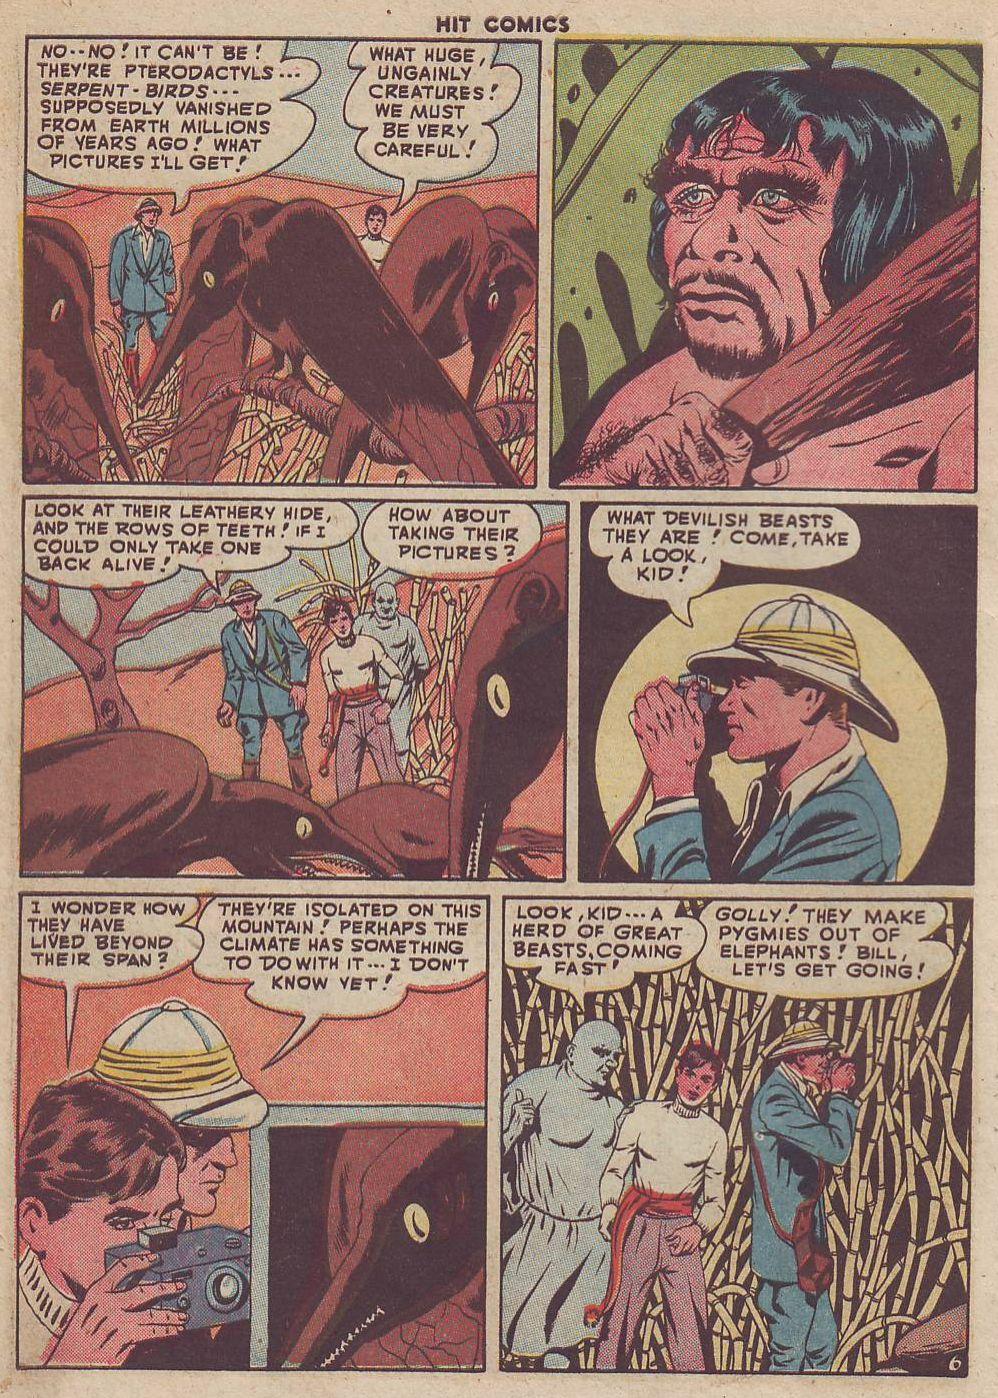 Read online Hit Comics comic -  Issue #51 - 8